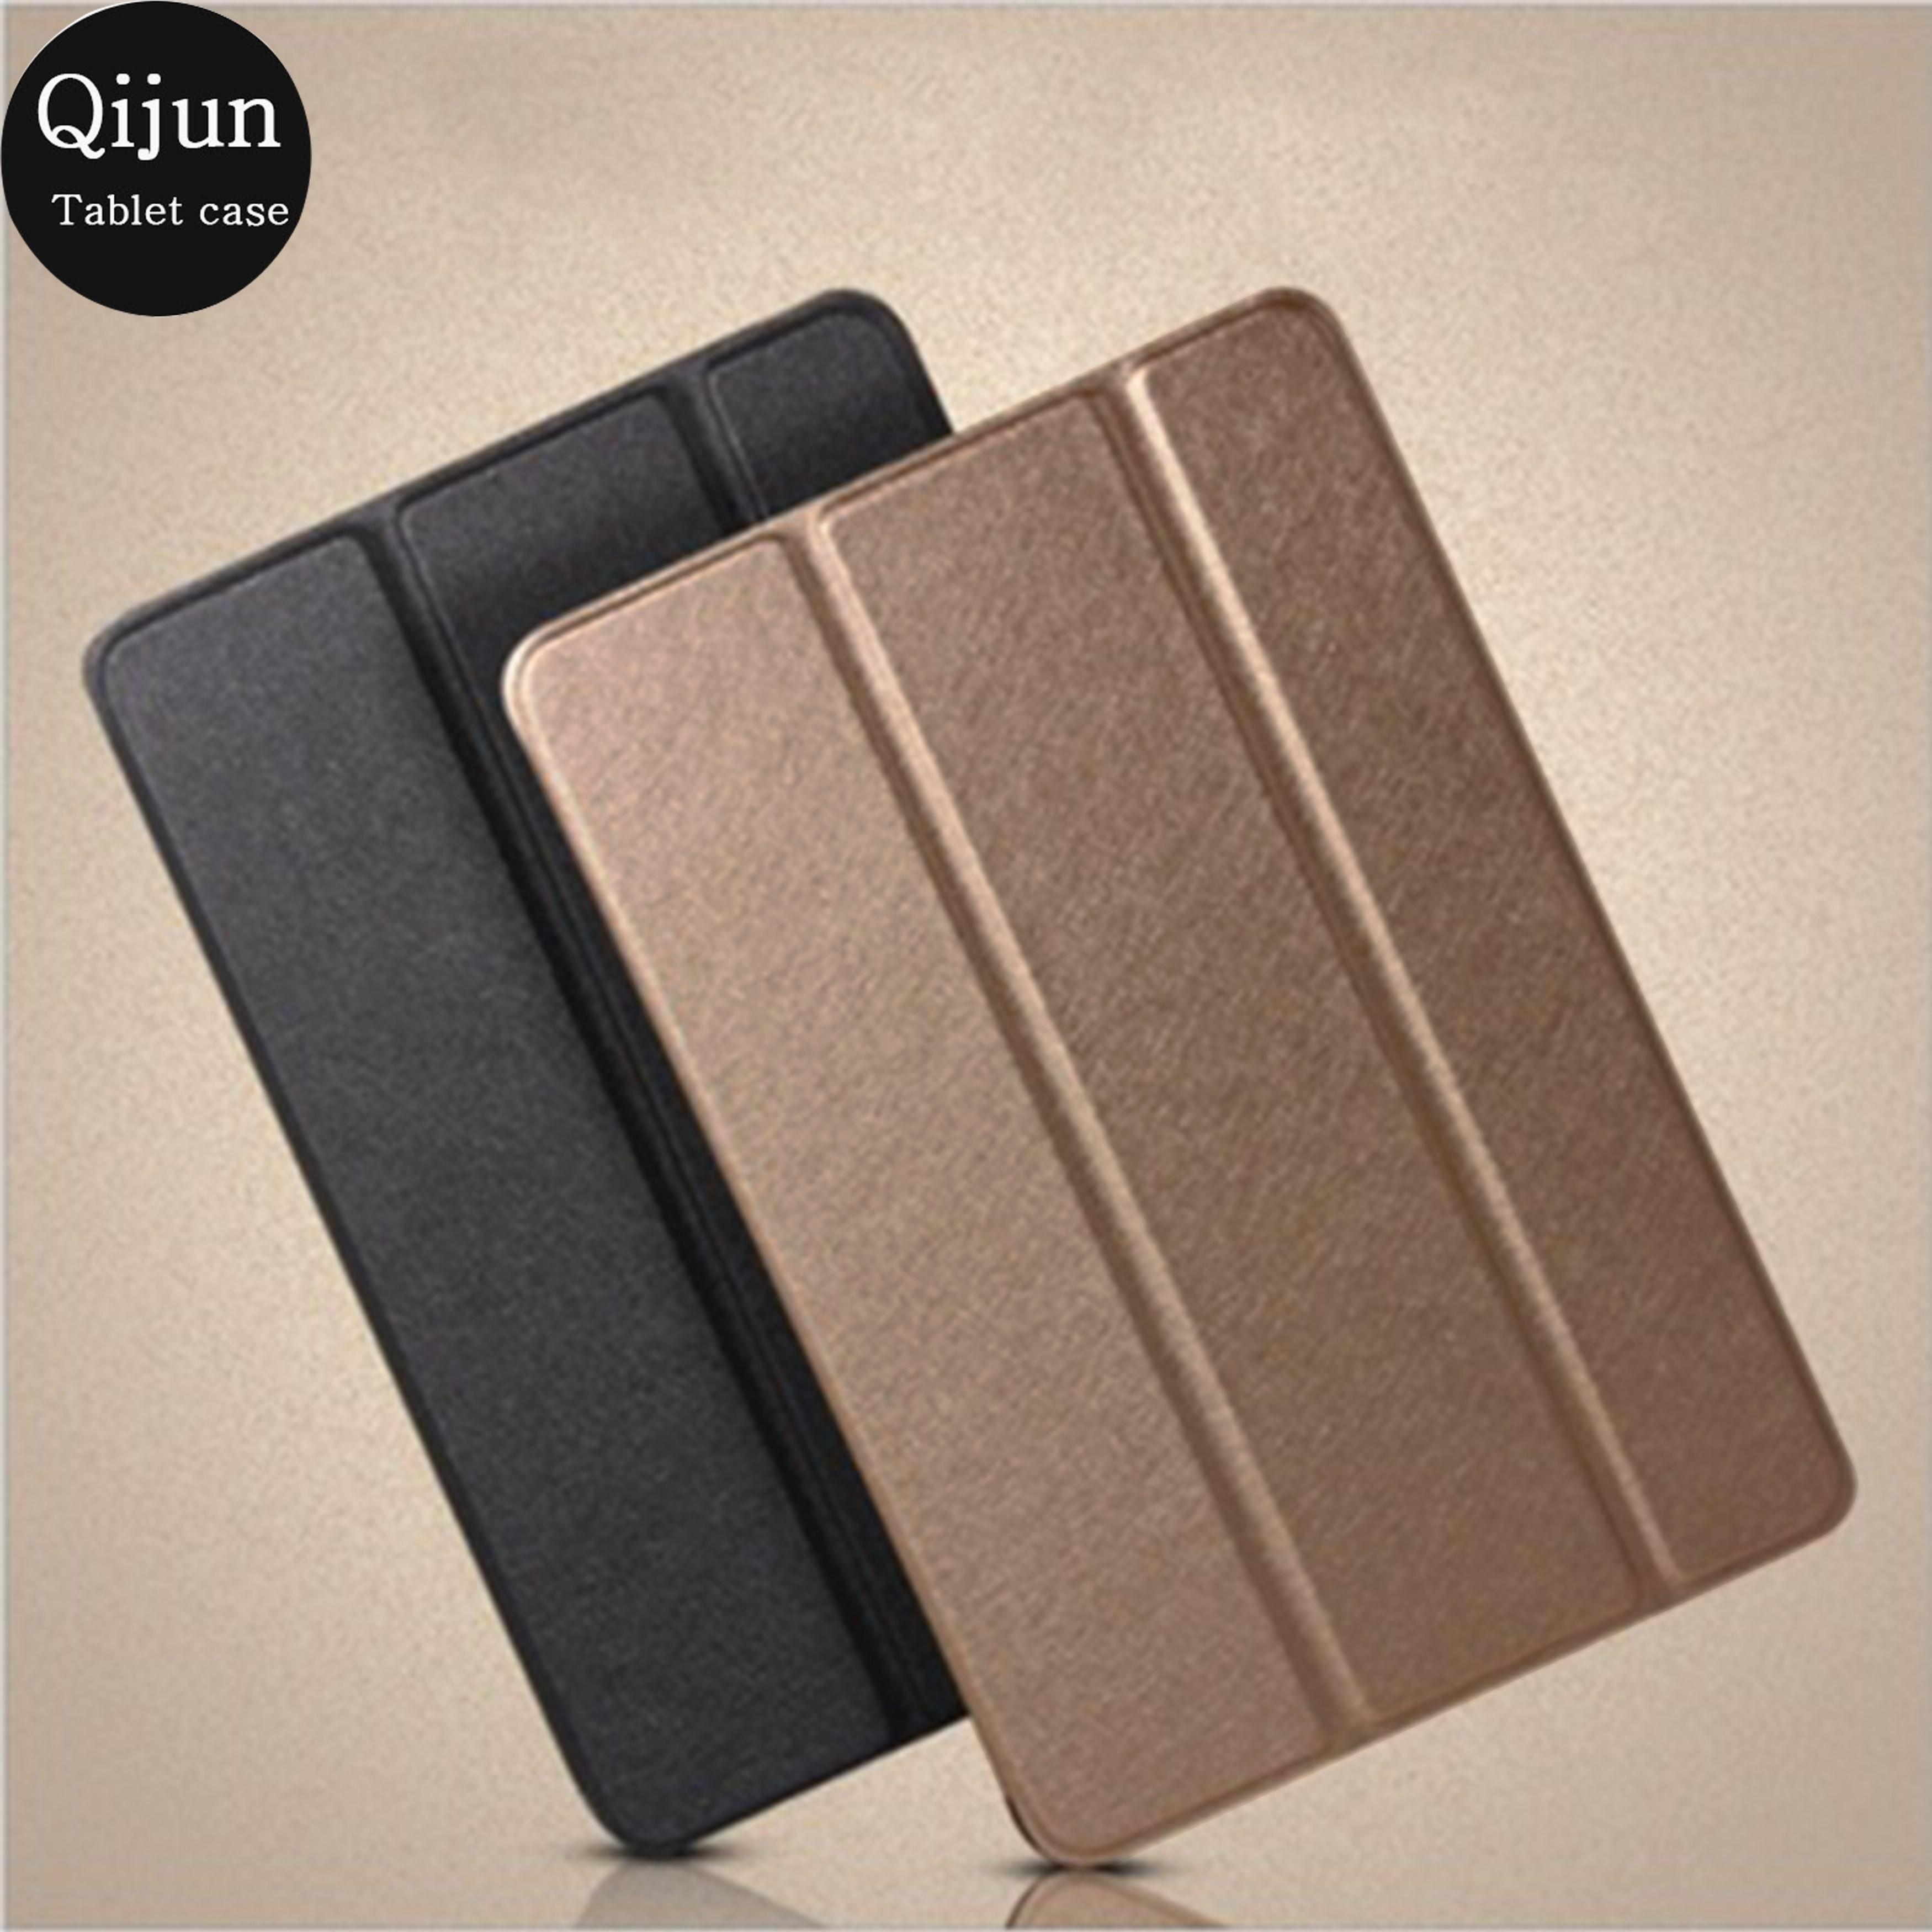 Nuevo para Huawei MediaPad M3 8,4 pulgadas BTV-DL09 BTV-W09 8,4 ''funda Smart Magnetic Fundas flip Tablet cubierta soporte carcasa